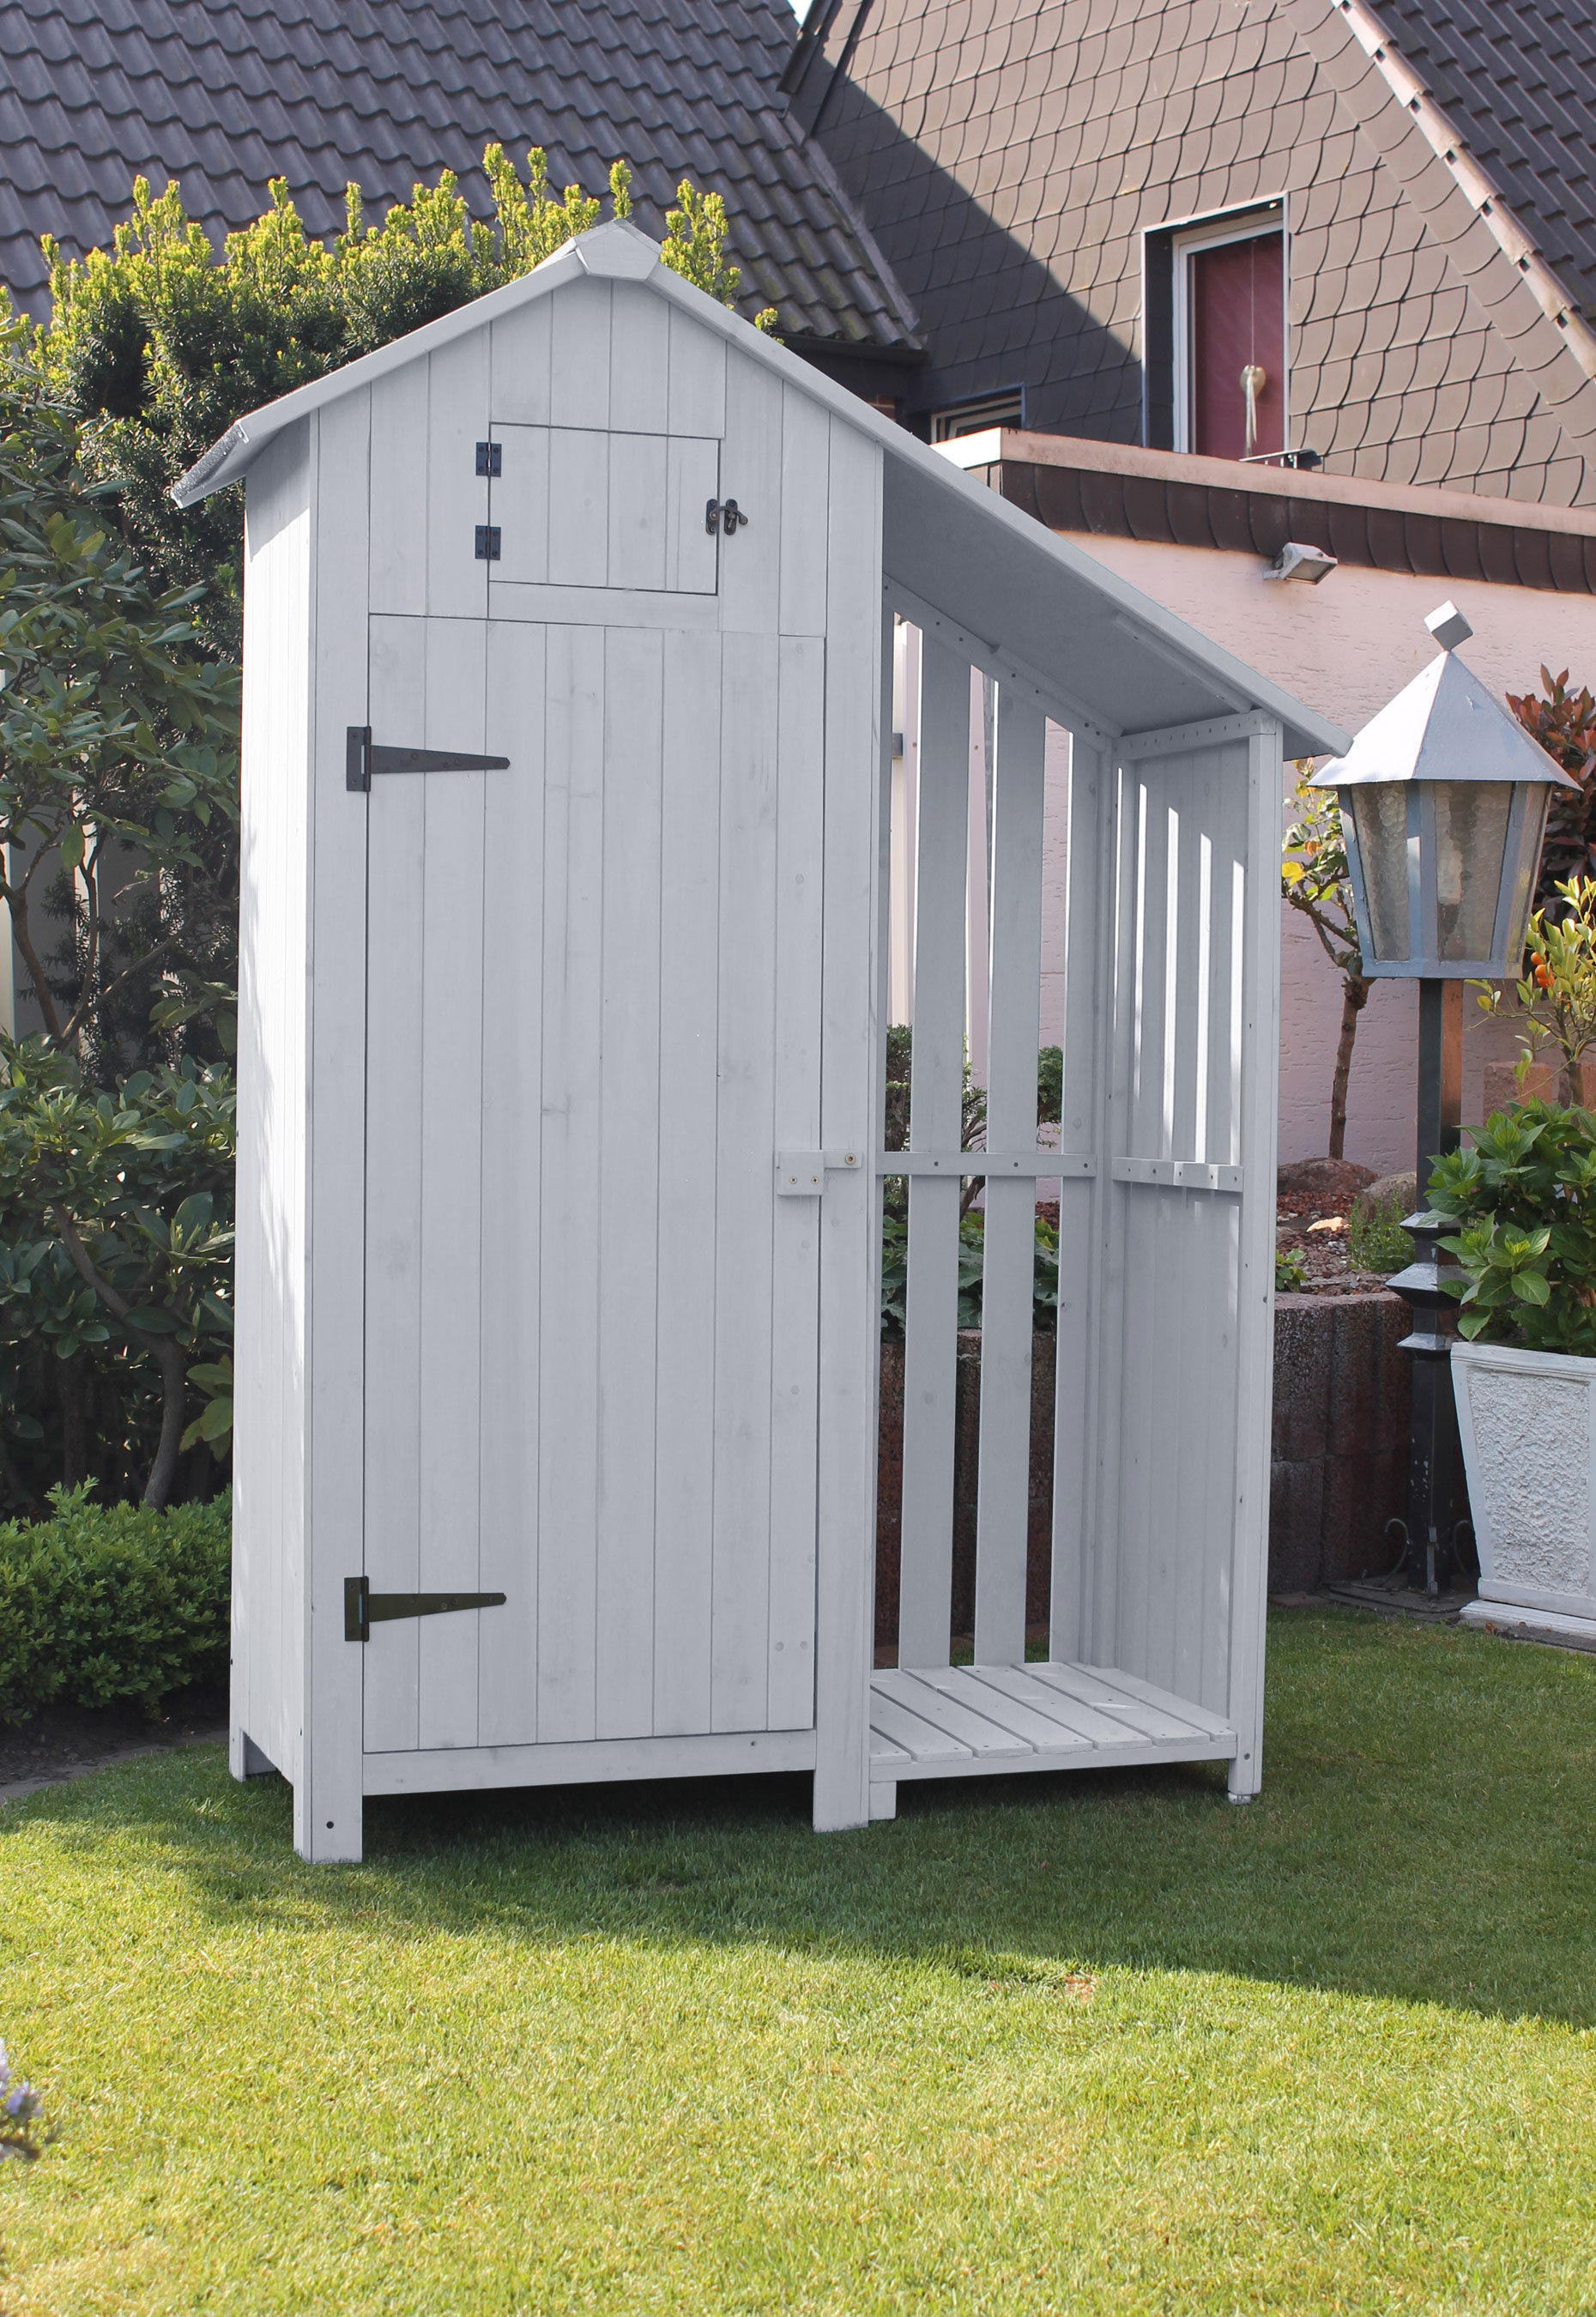 Gartenhaus Holz Weiß JB62 – Hitoiro